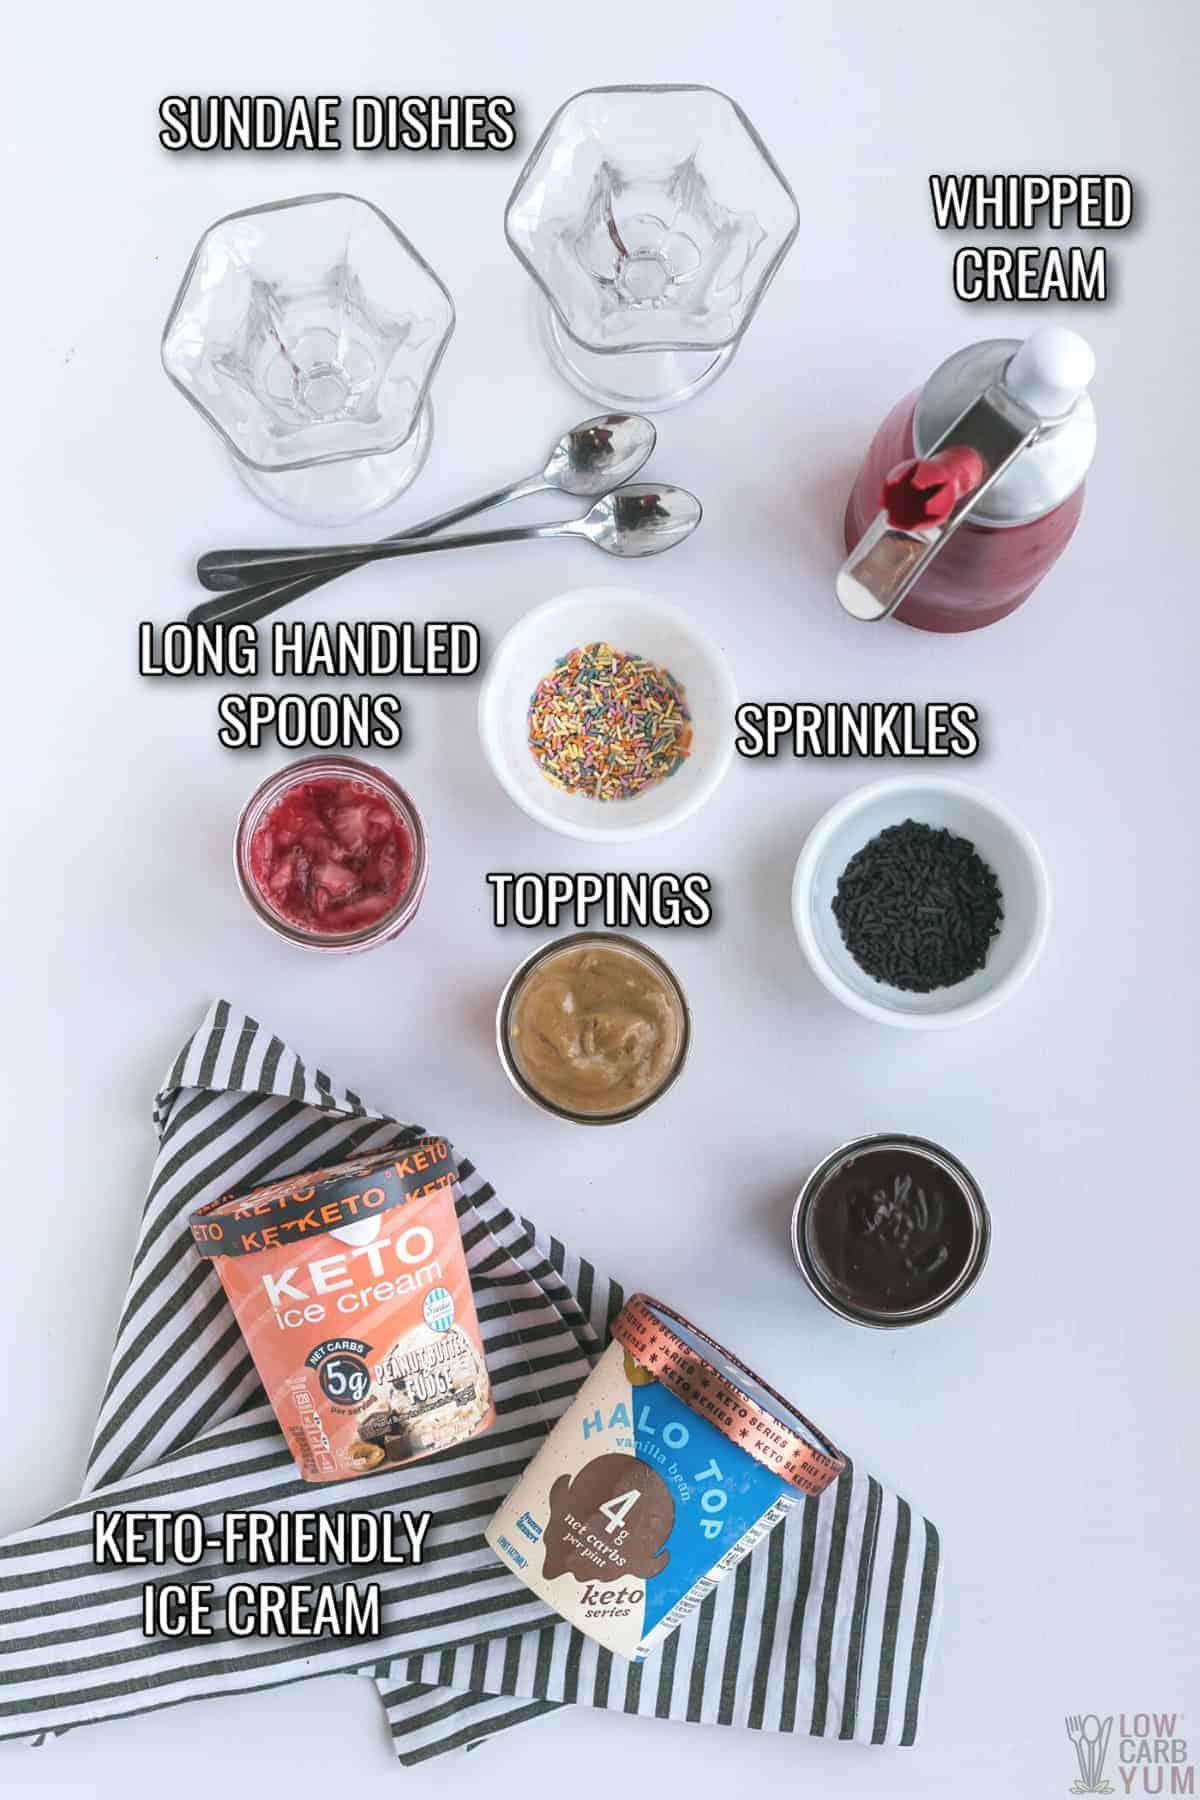 perfect ice cream sundae ingredients and tools